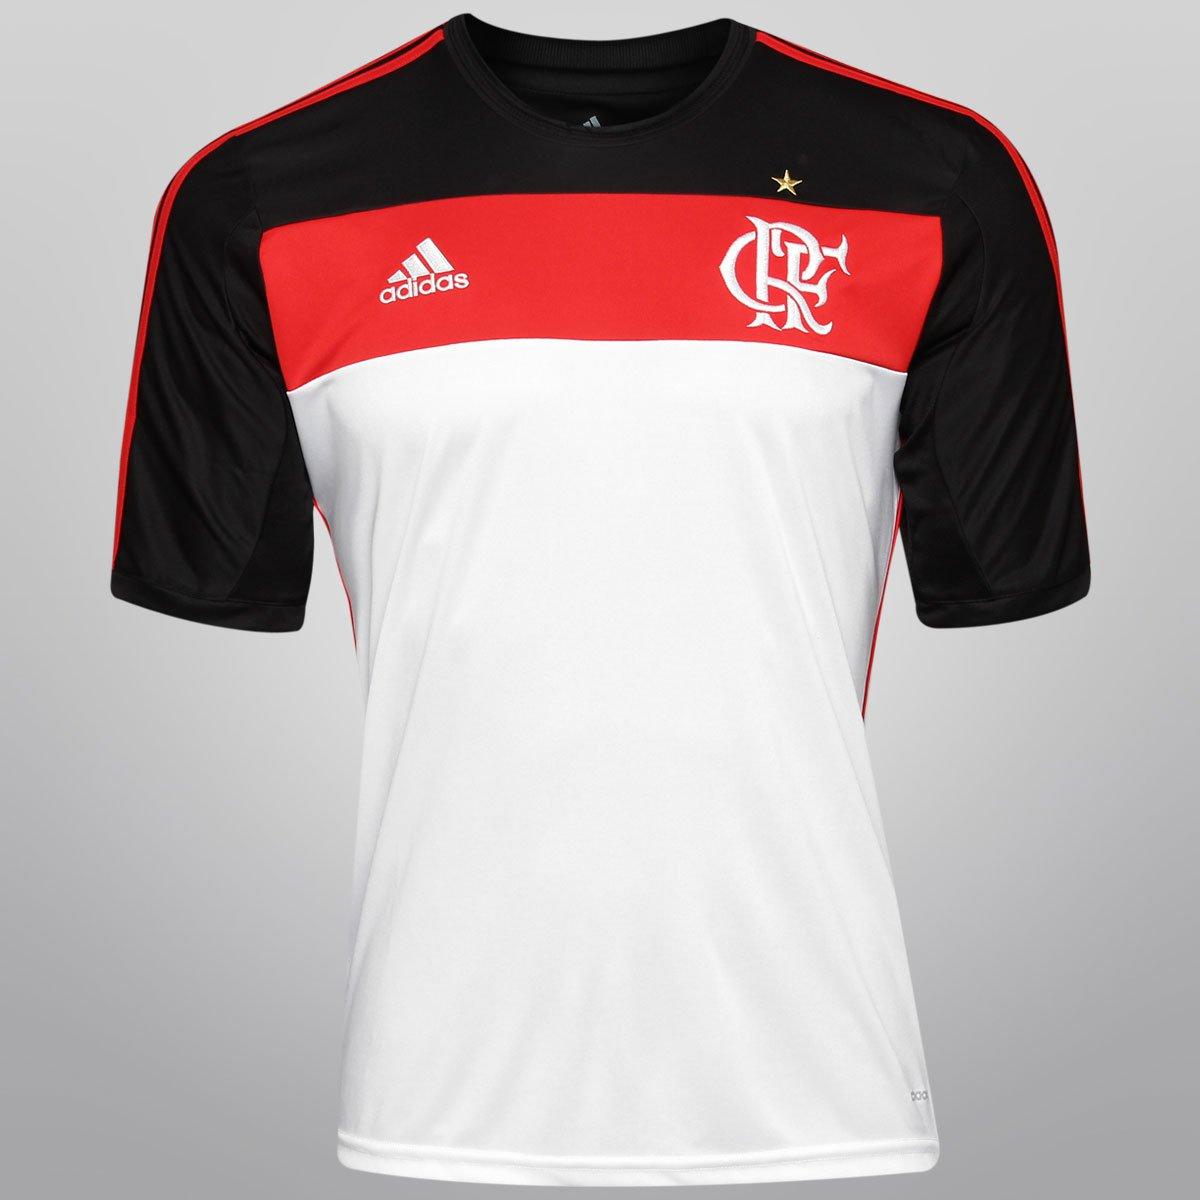 Camisa Adidas Flamengo II 13 14 s nº - Compre Agora  2ab2432bbbd